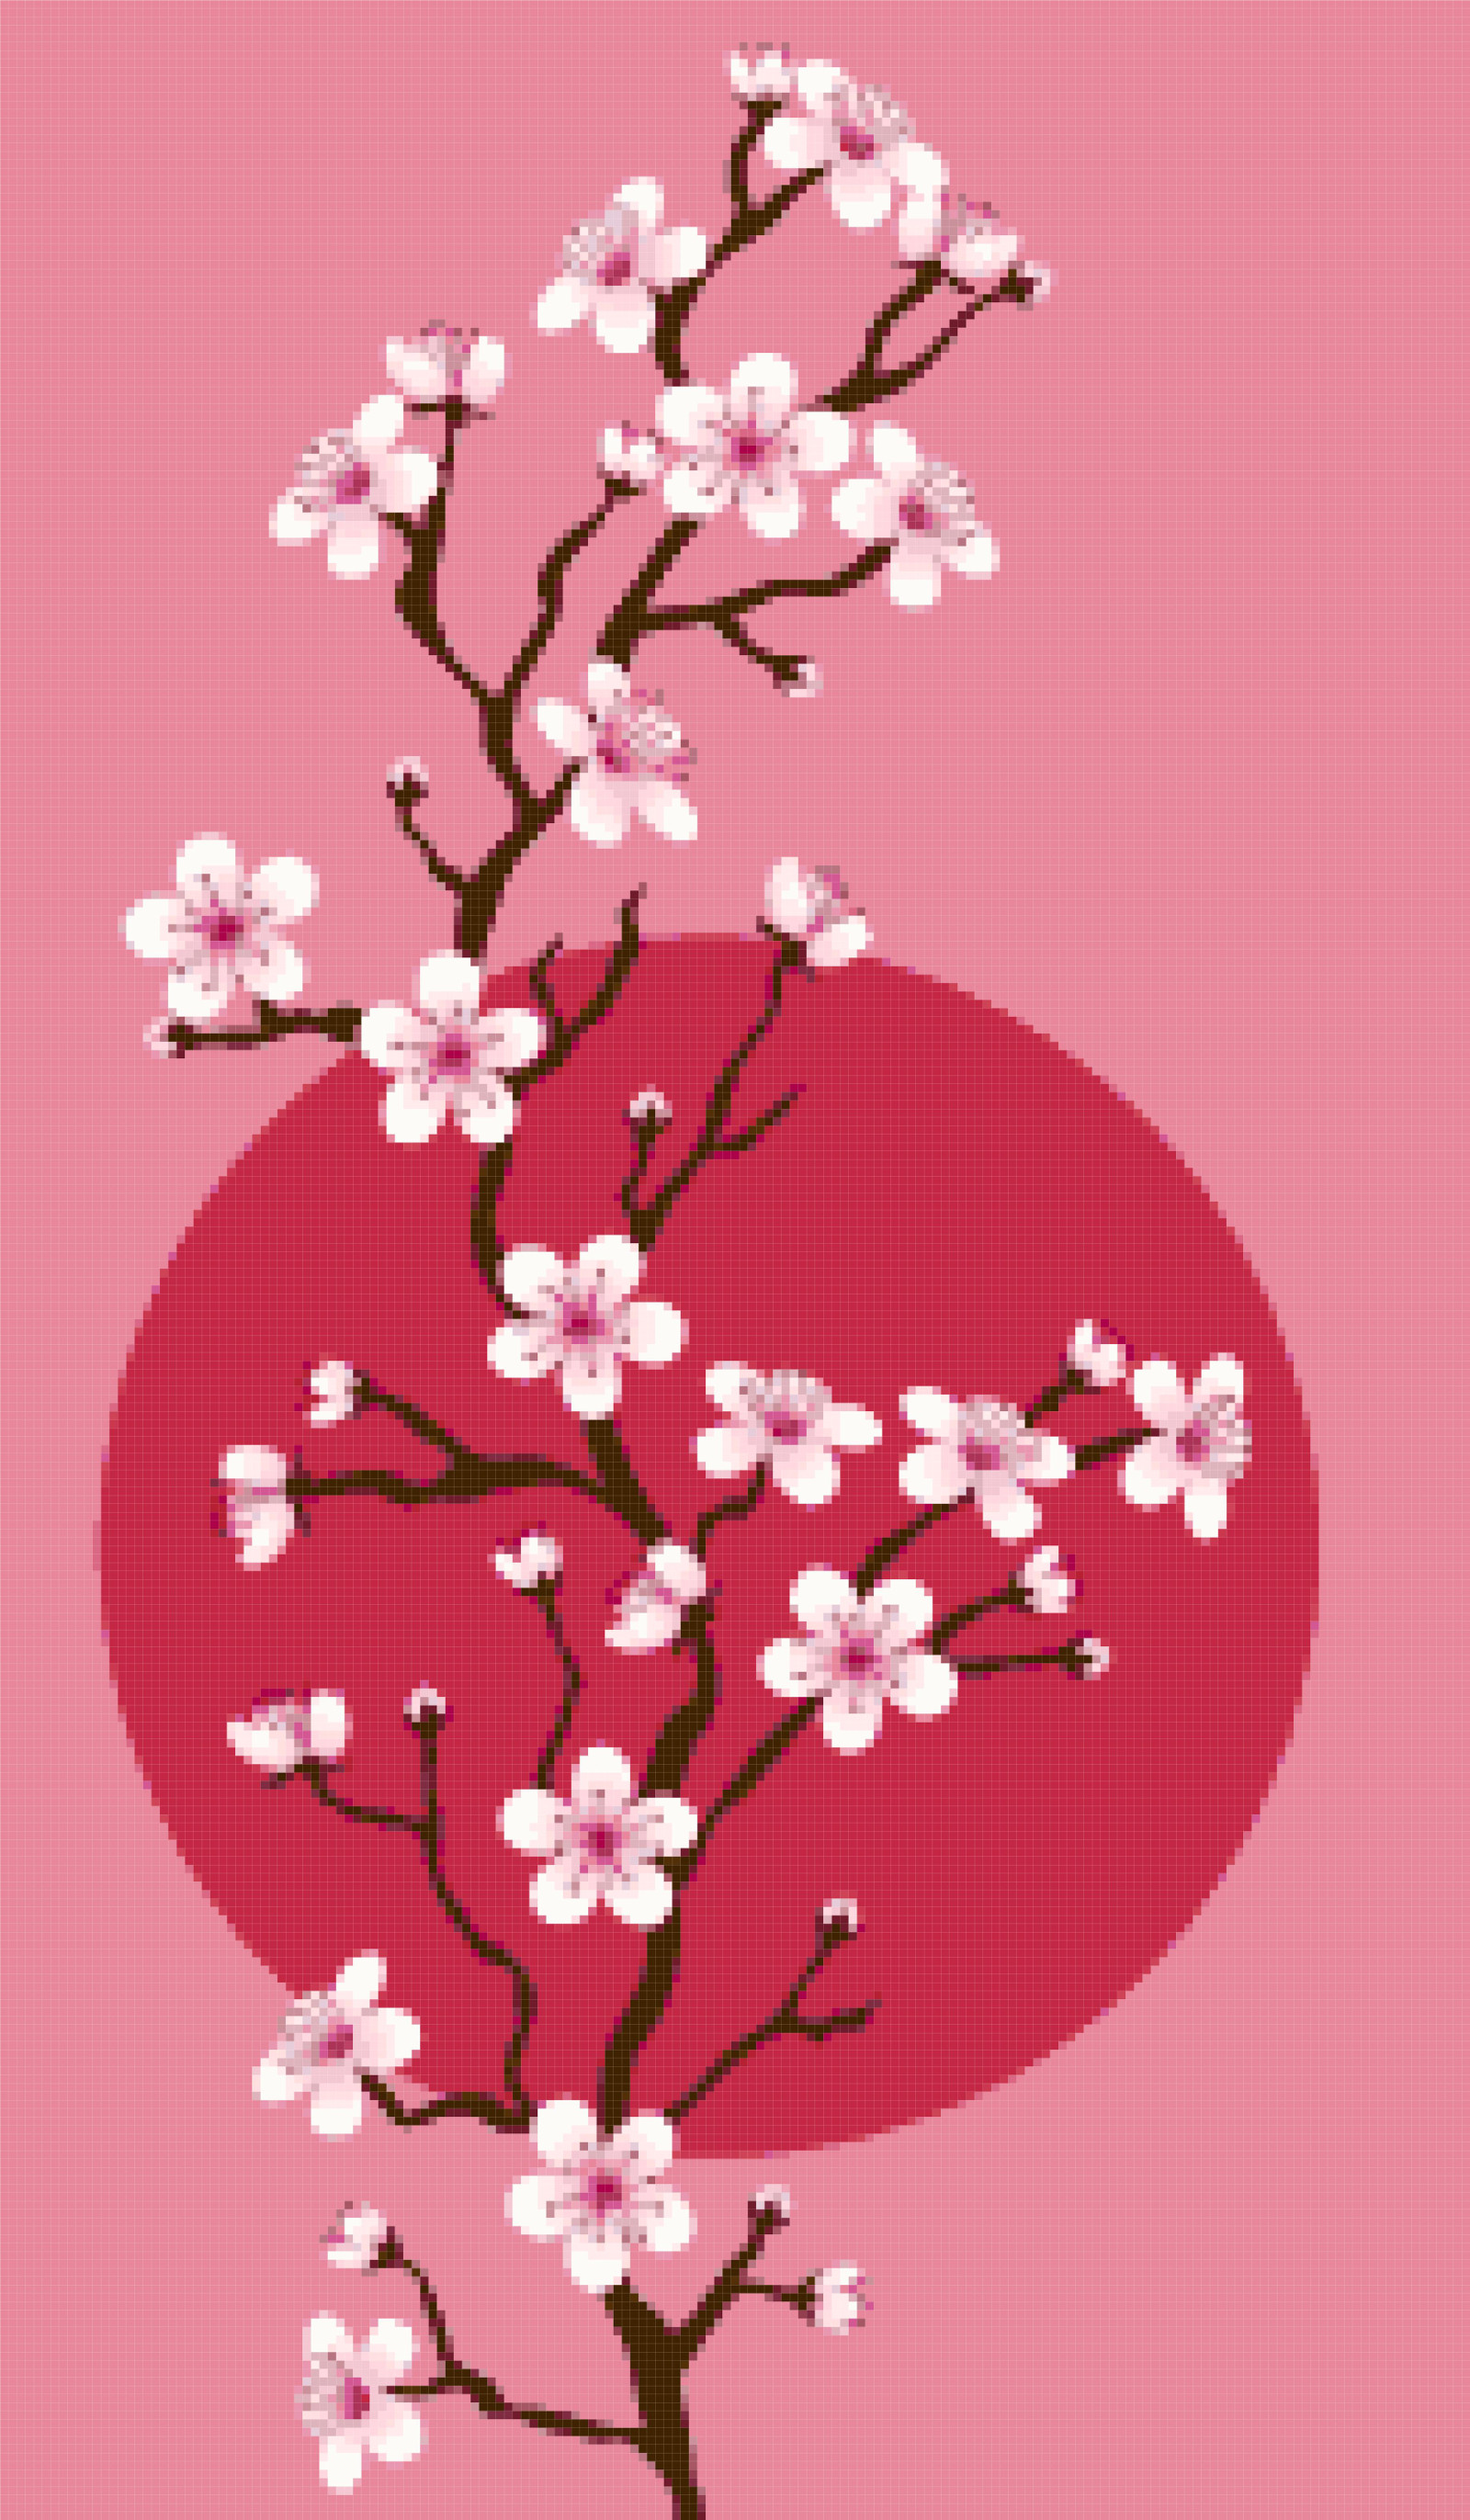 blossom cross stitch image